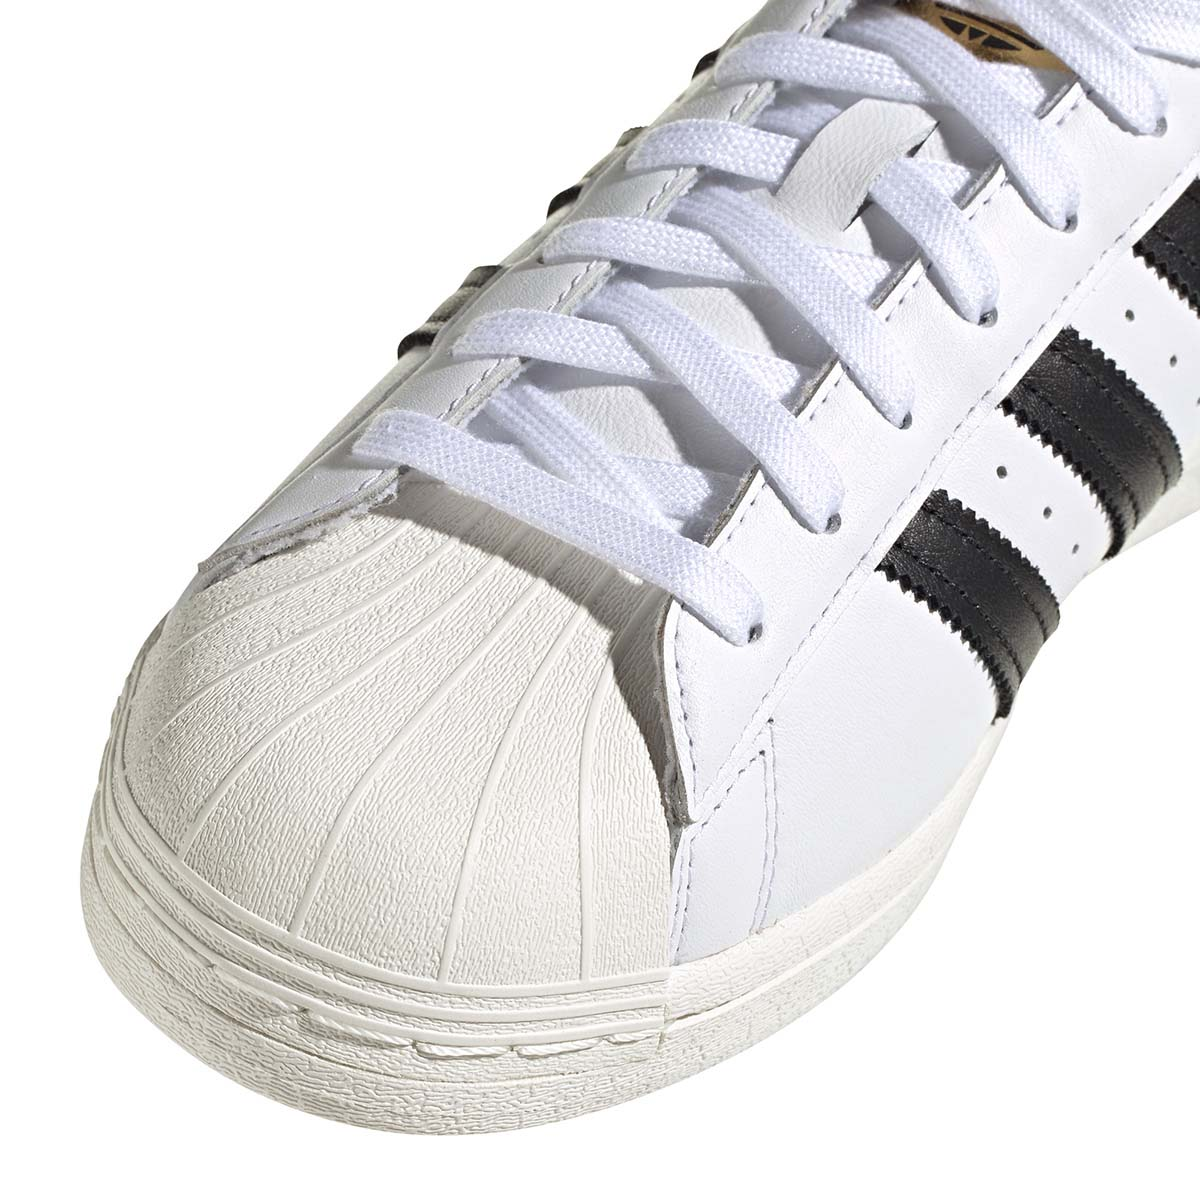 adidas SUPER STAR MULE FOOTWEAR WHITE / CORE BLACK / GOLD METALLIC FX5851 アディダス スーパースター ミュール ホワイト/ブラック/ゴールド